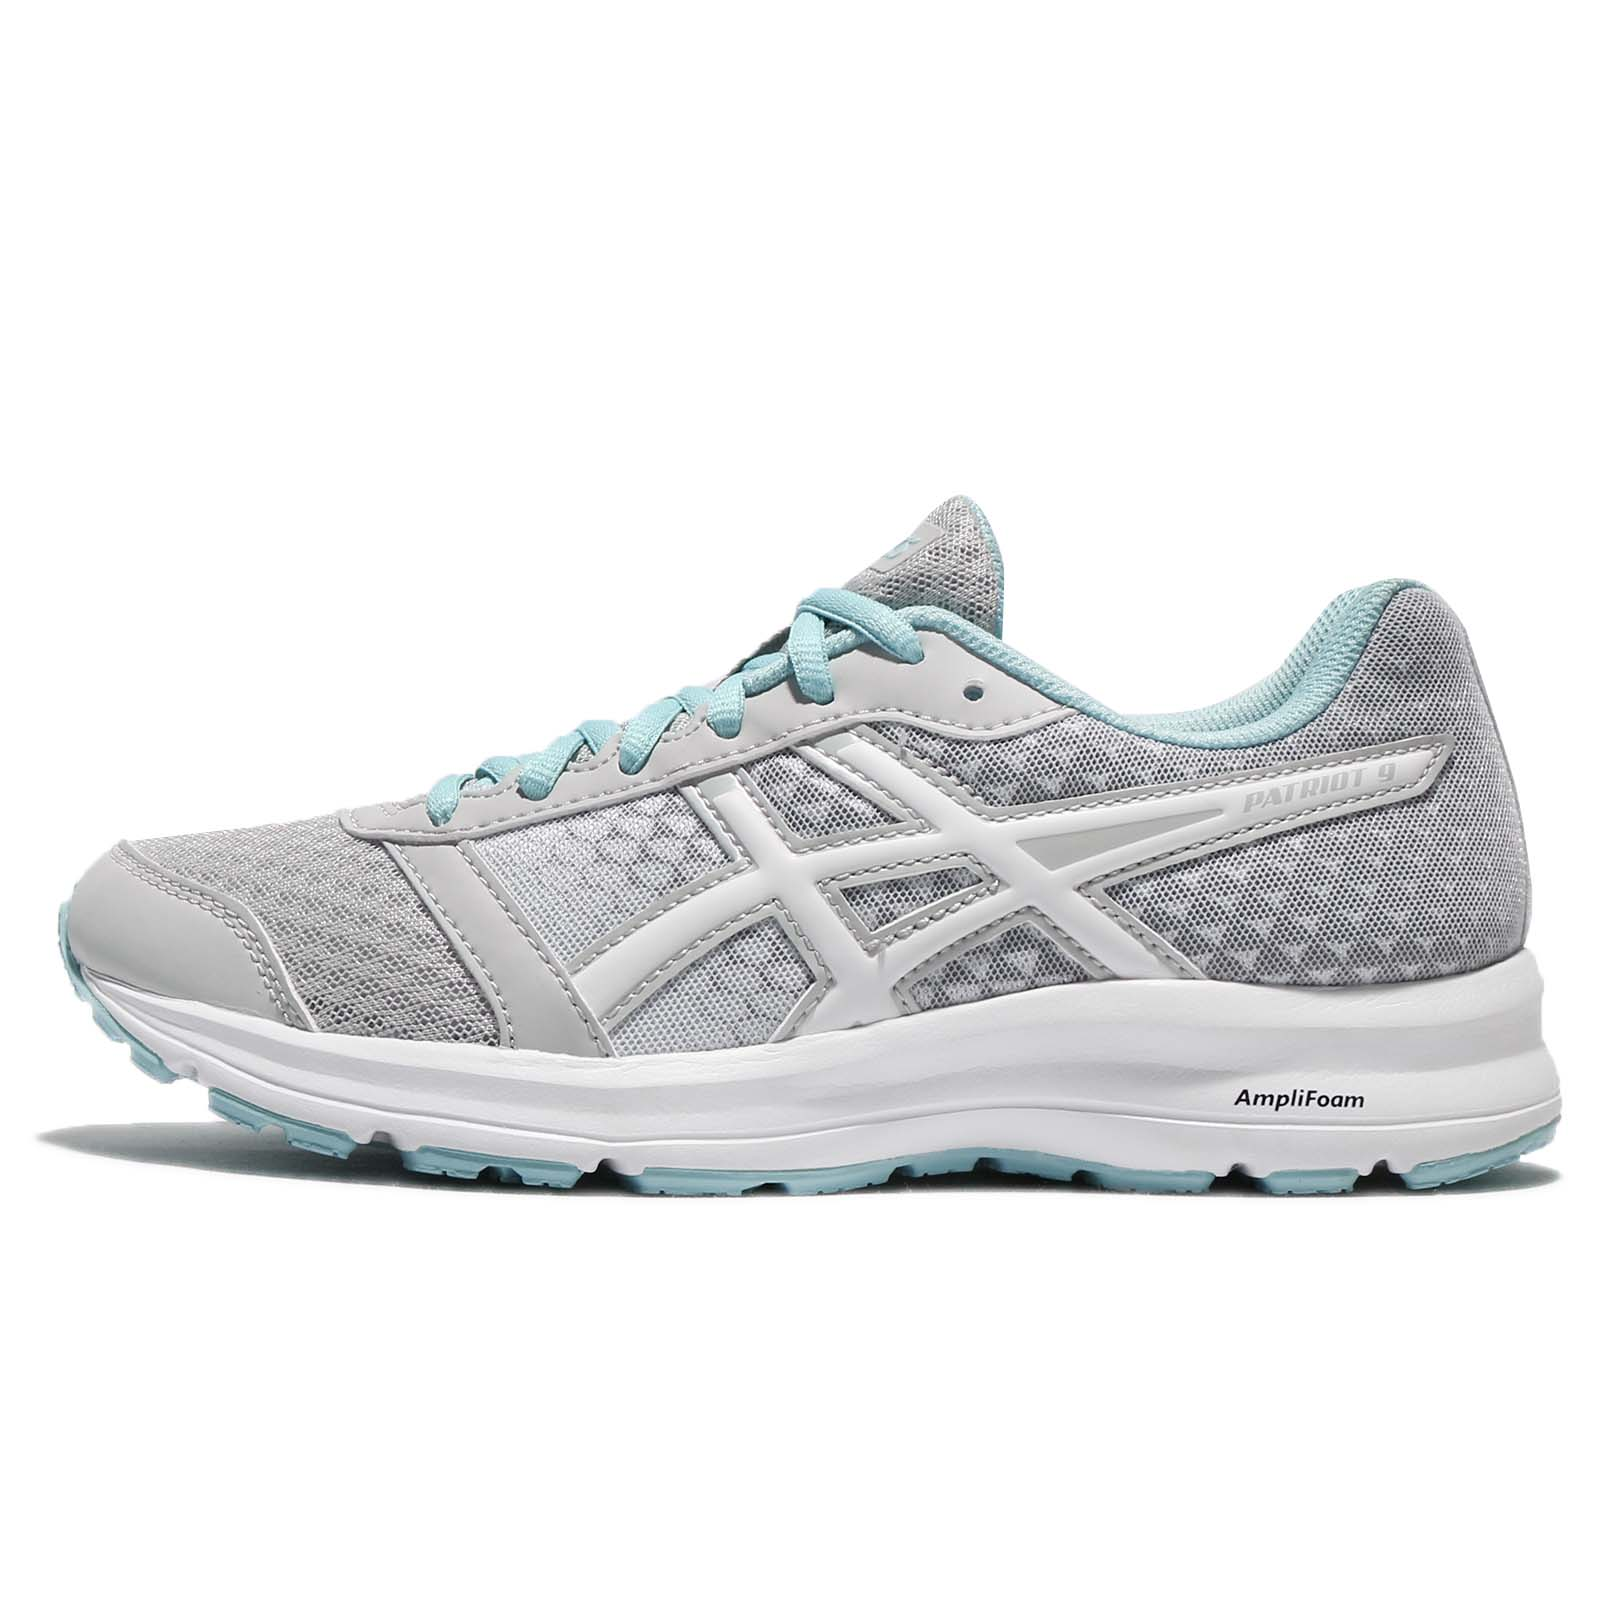 asics patriot 9 women's running shoes zero